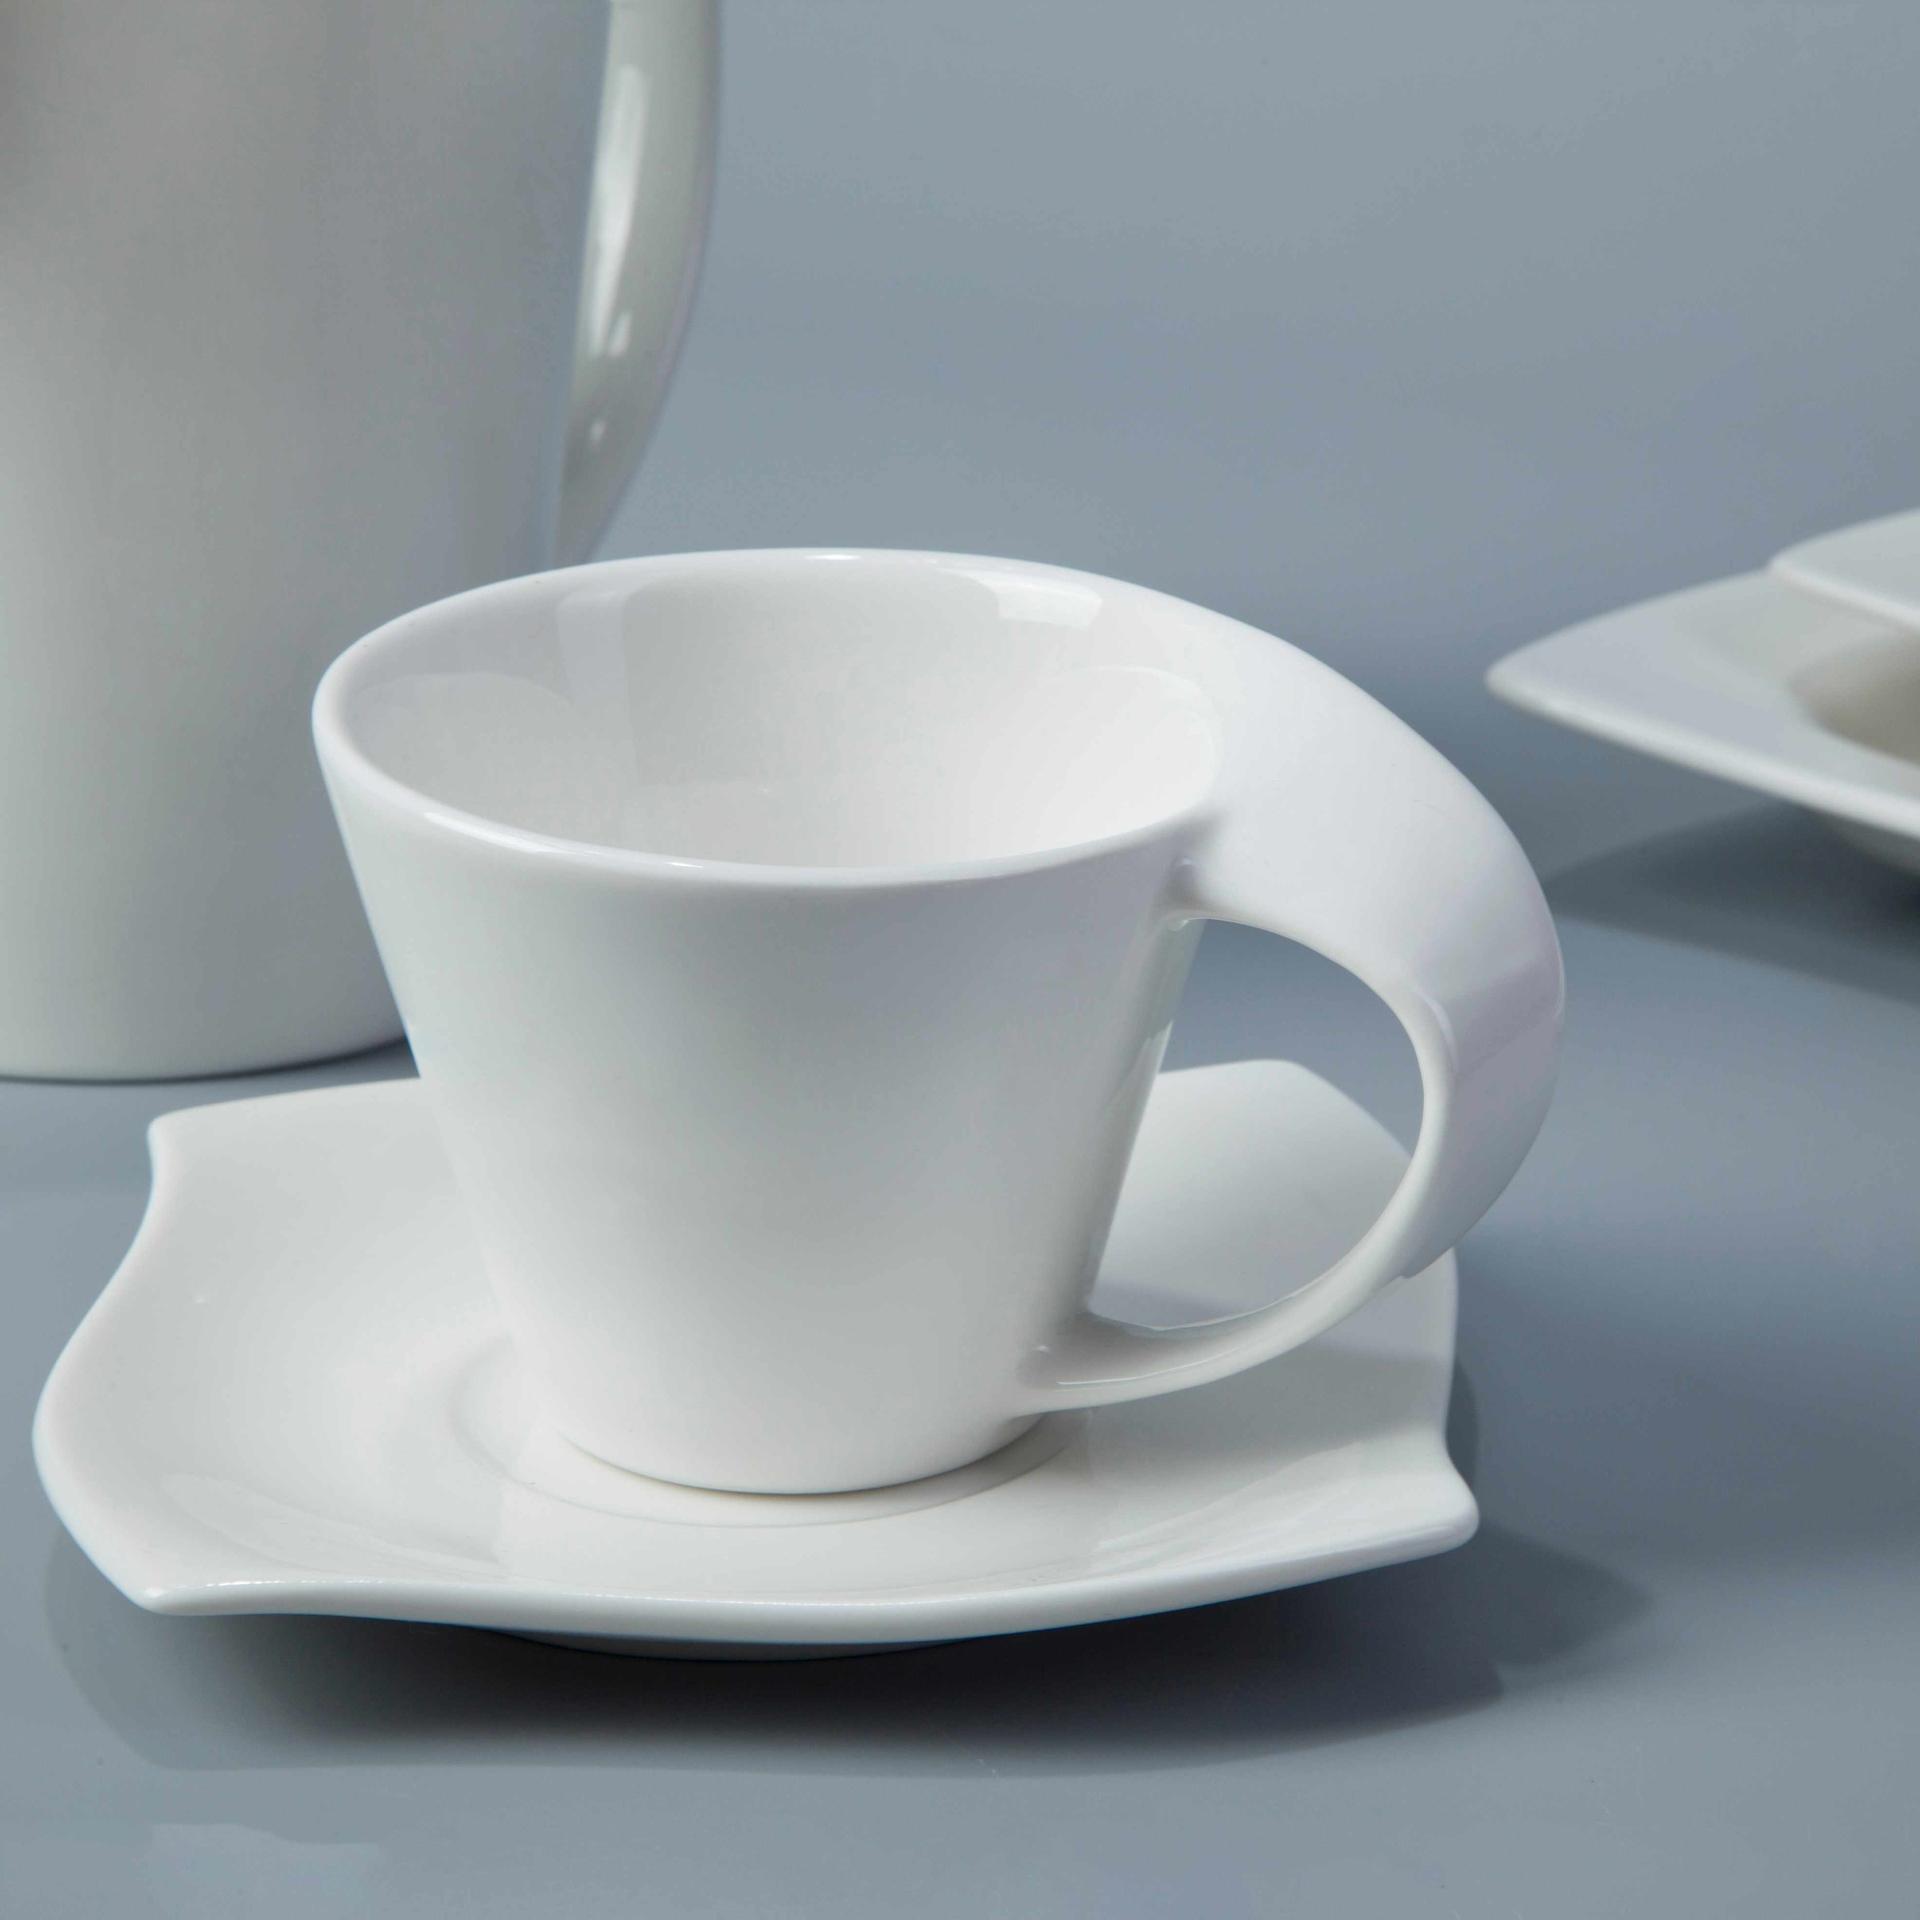 Contemporary White Porcelain Dinnerware Restaurant - TW16